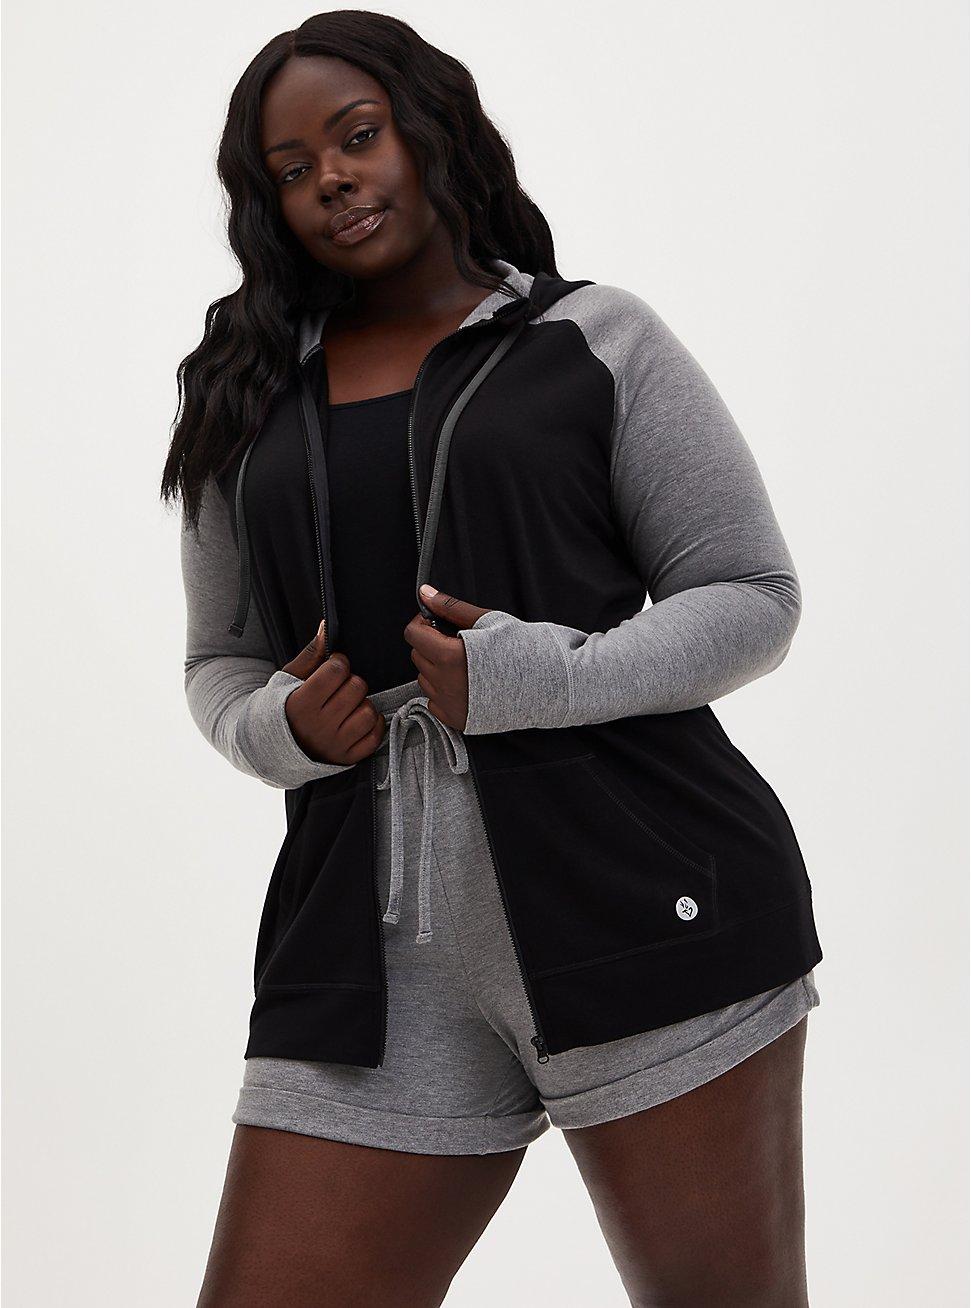 Black & Grey Terry Active Zip Hoodie, DEEP BLACK, hi-res